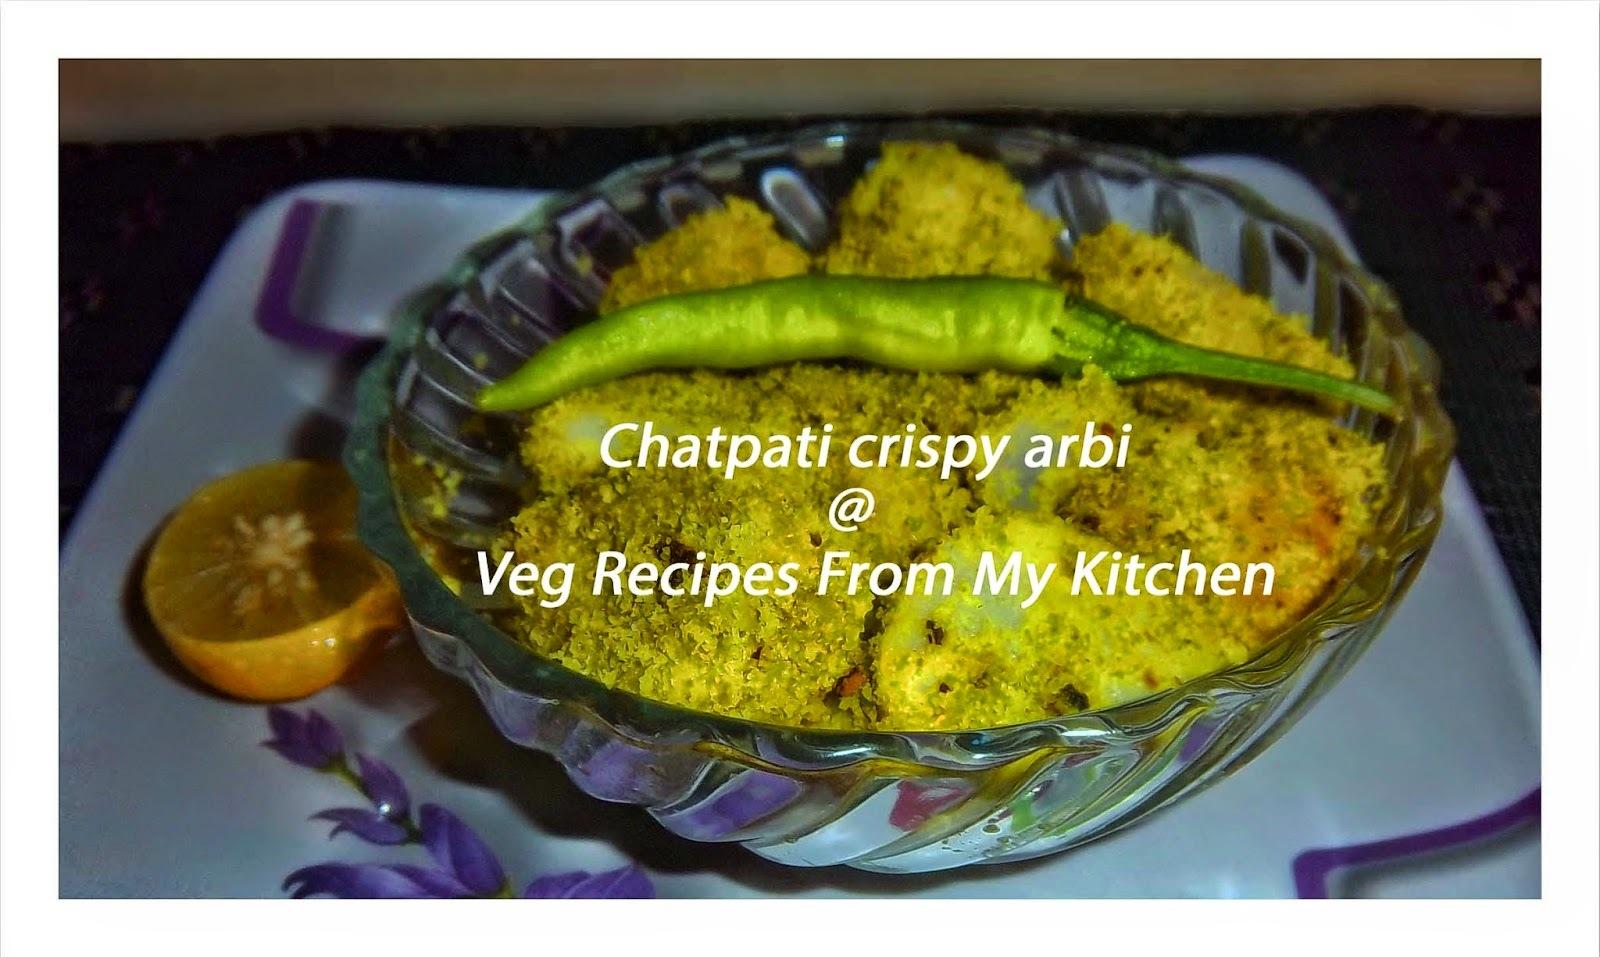 chatpati crispy arbi(spicy-crispy colocasia)